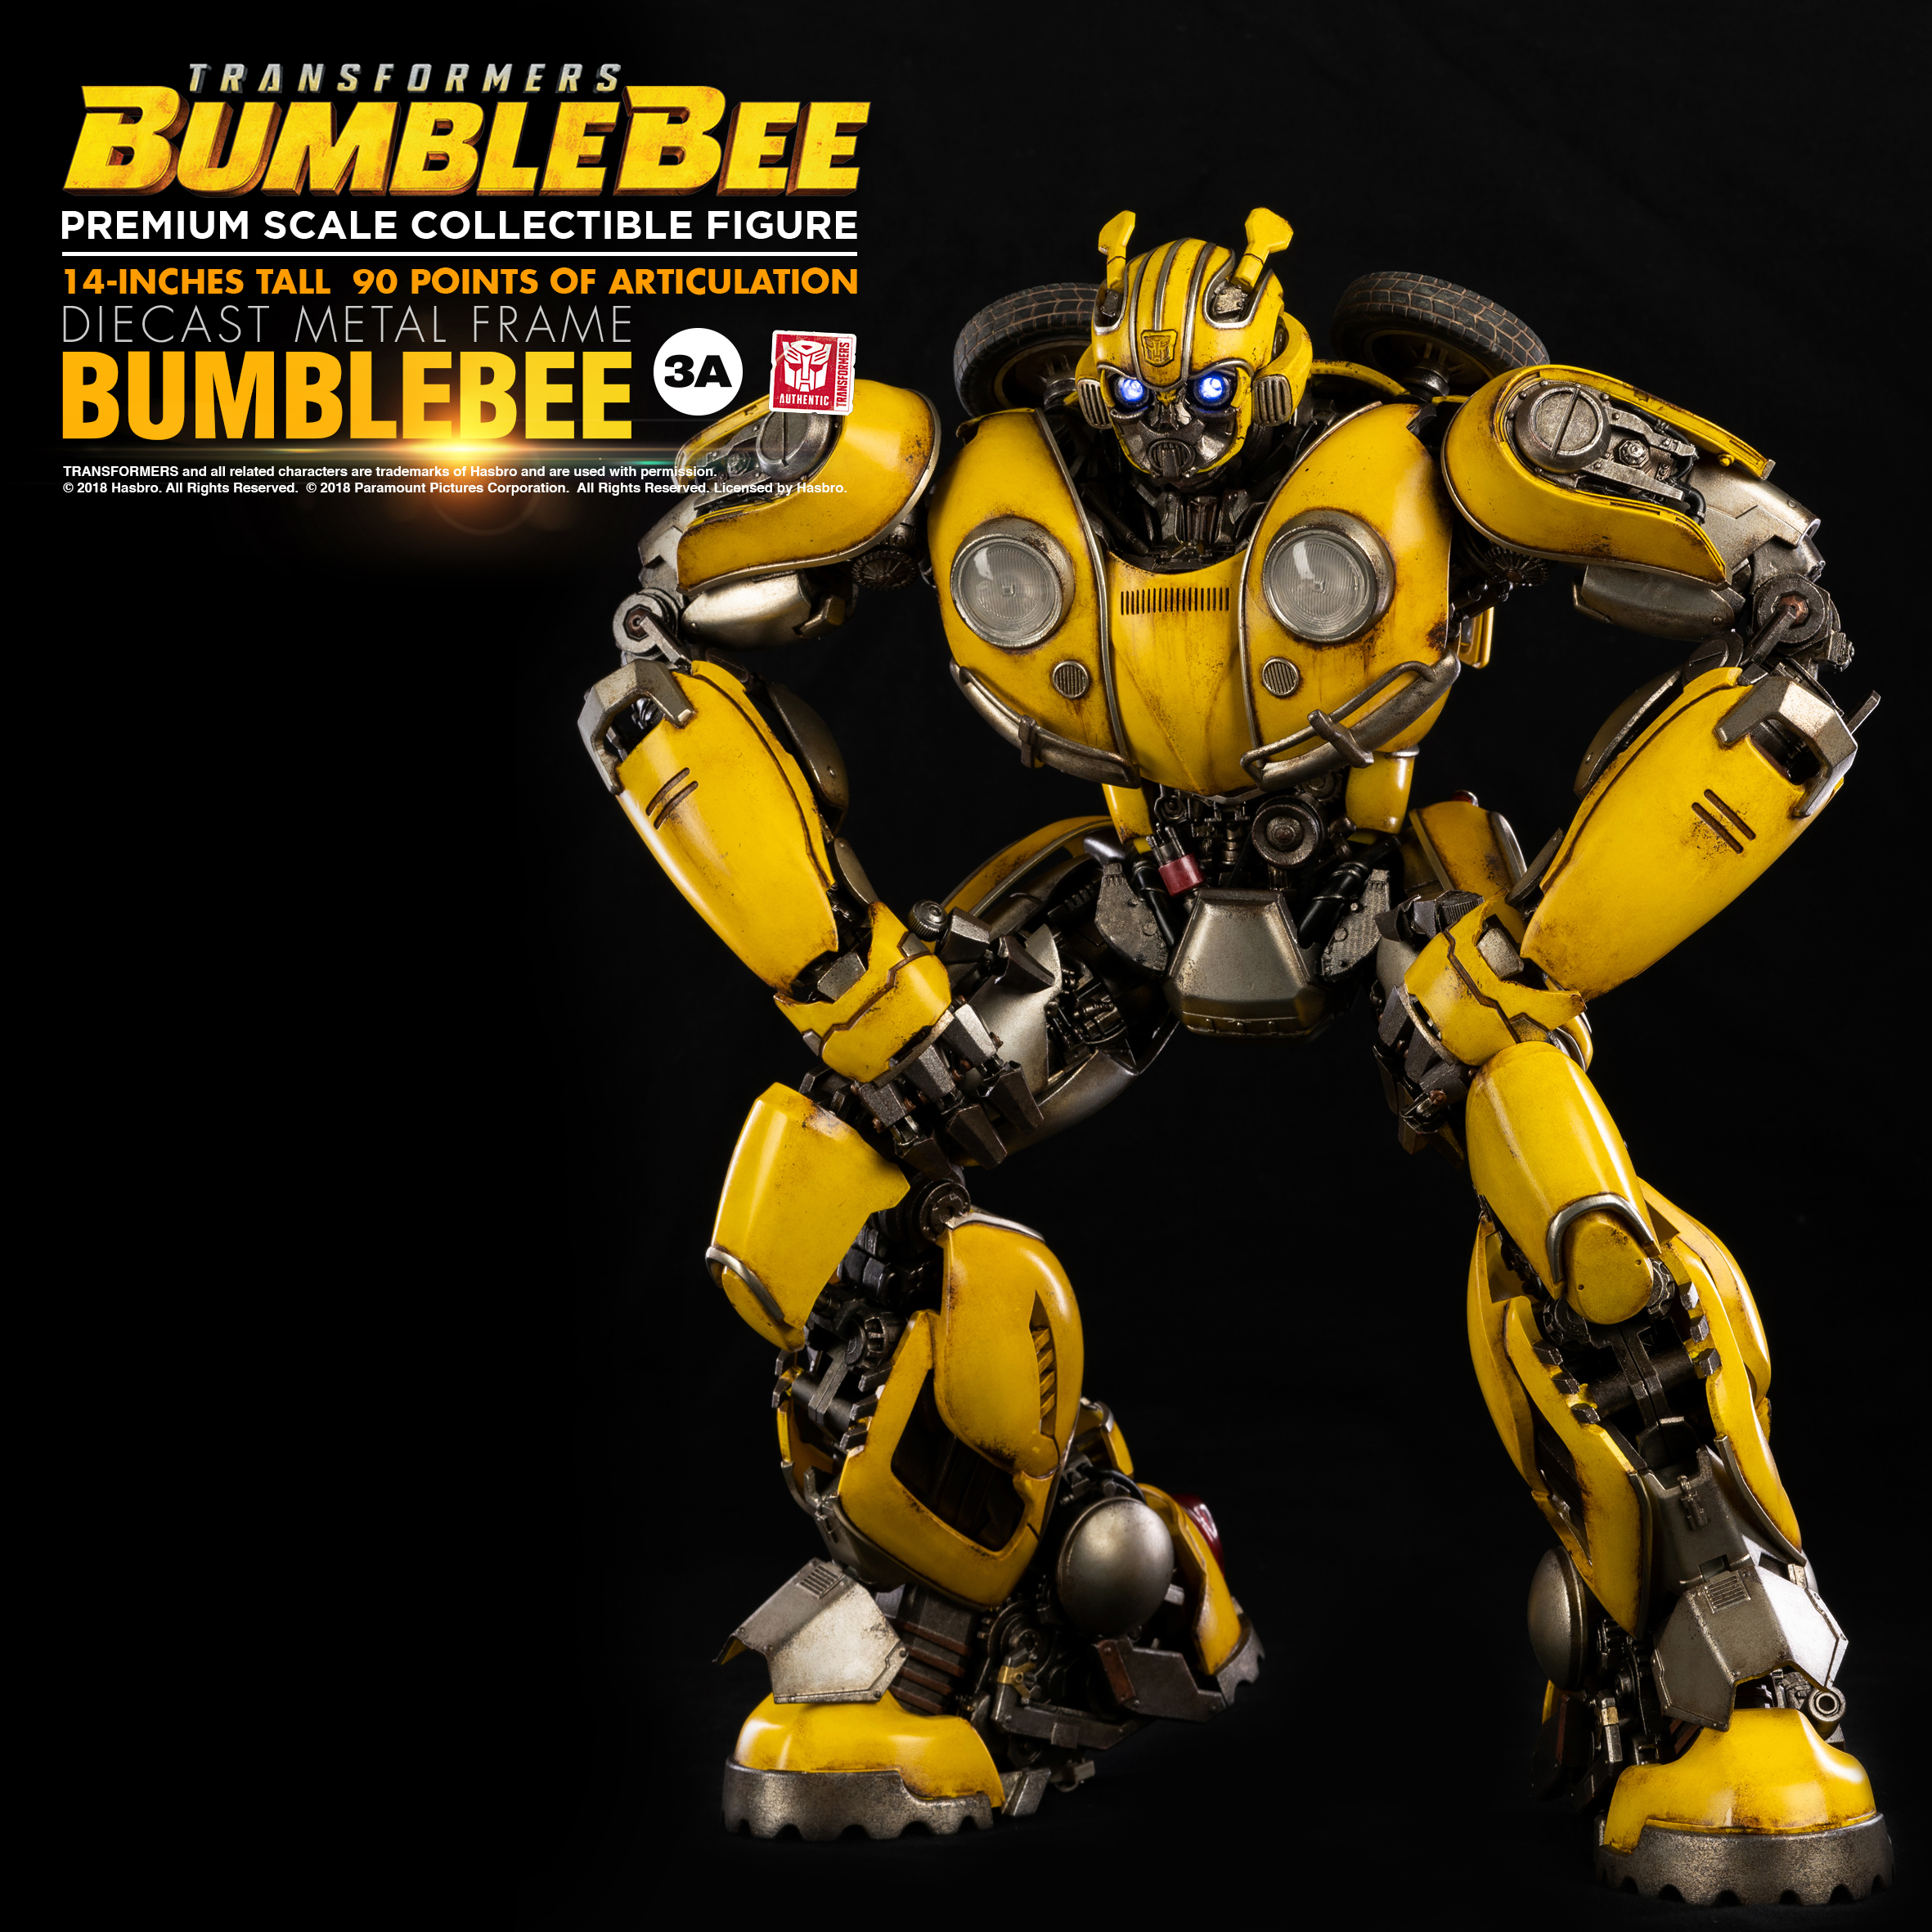 Bumblebee_ENG_PM_SQUARE_002.jpg